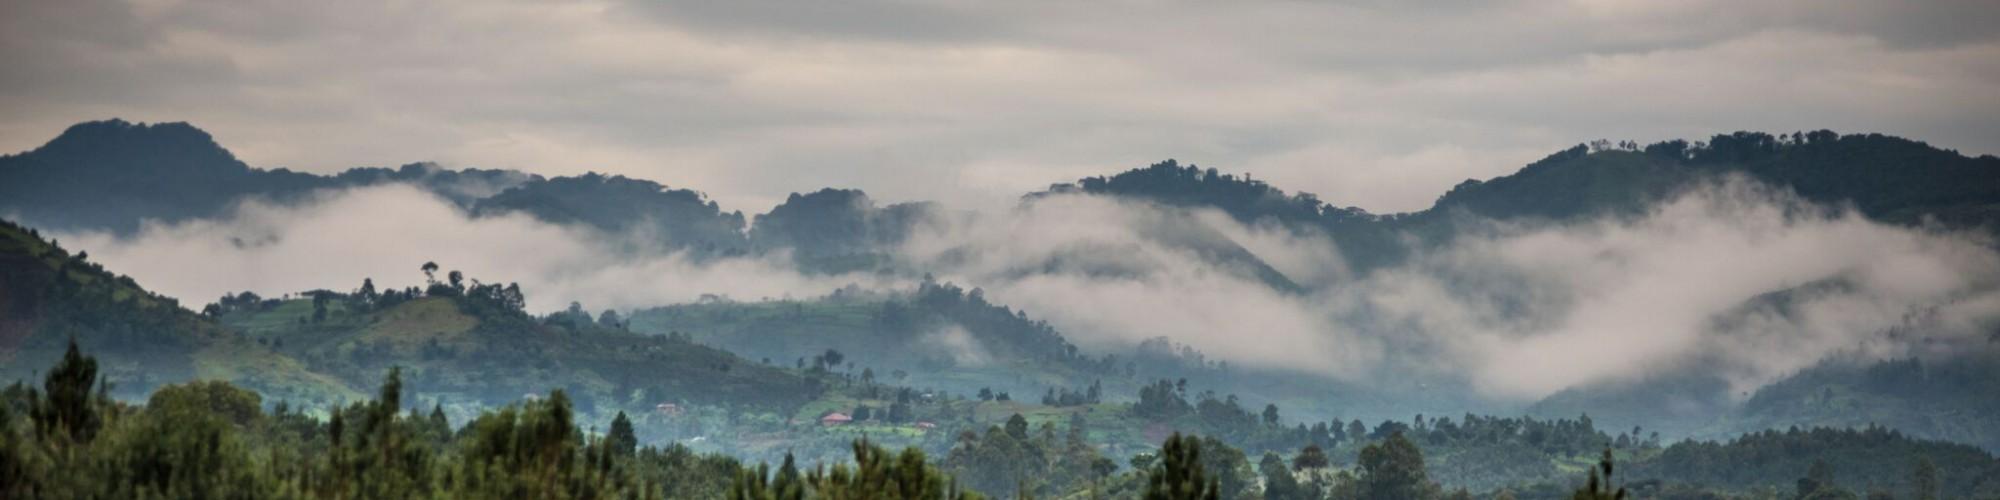 Volcanoes Bwindi_landscape